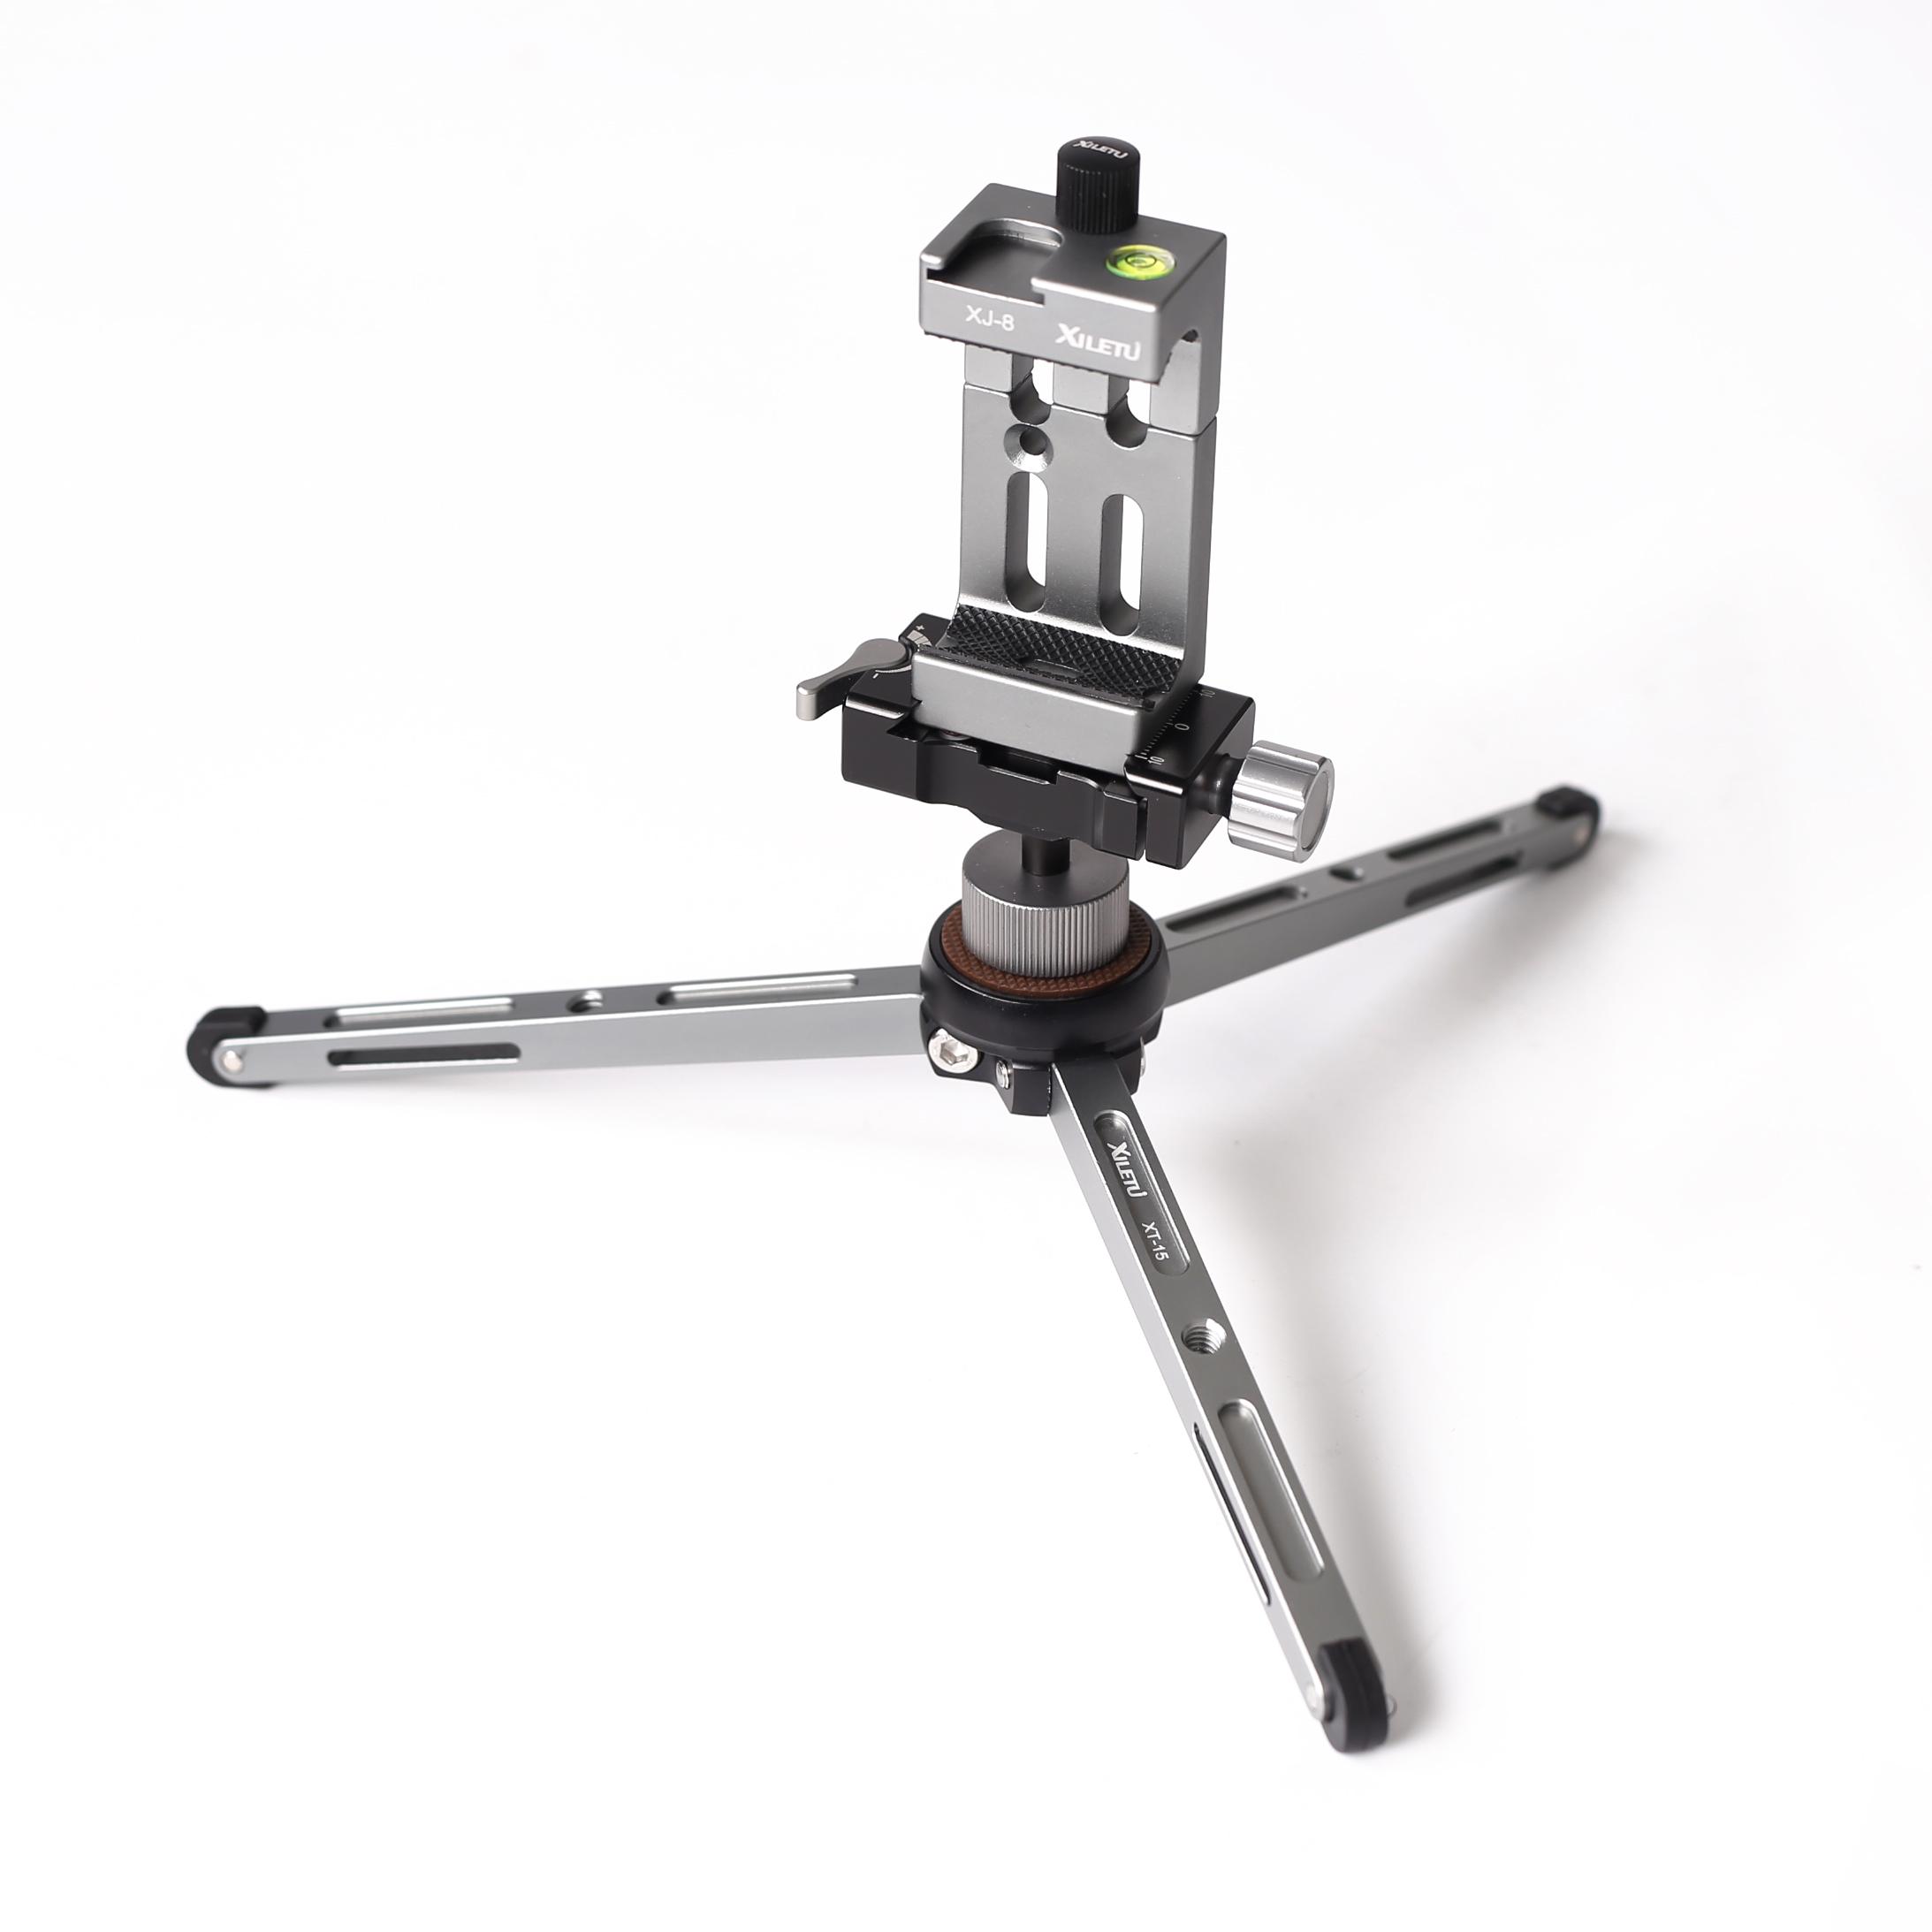 XILETU MT26+XT15 Mini Desktop Camera Phone Tripod Stand With Aluminum Ball Head Phone Clip